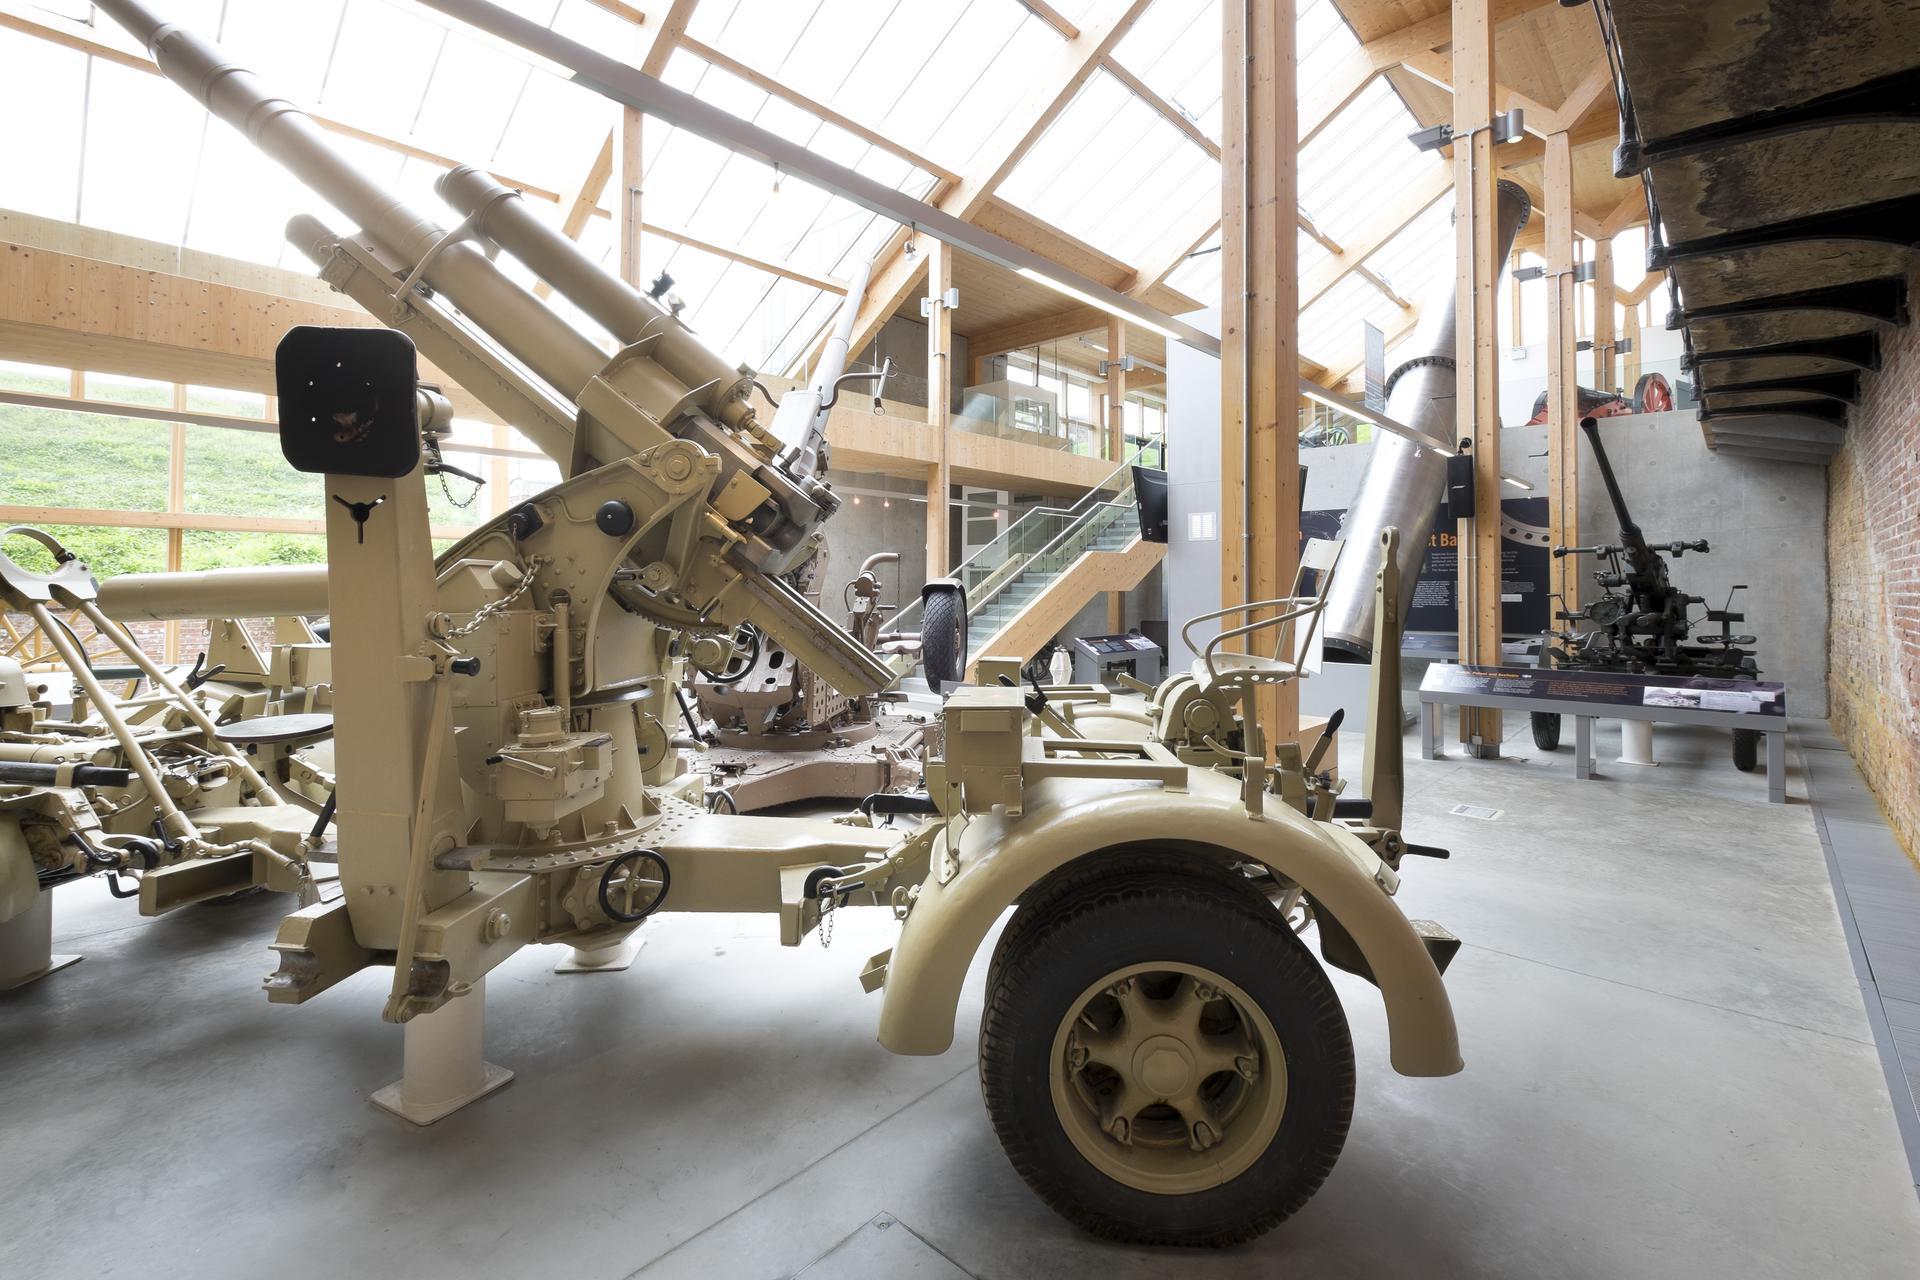 88 mm anti-aircraft gun - 88 mm Flak 36